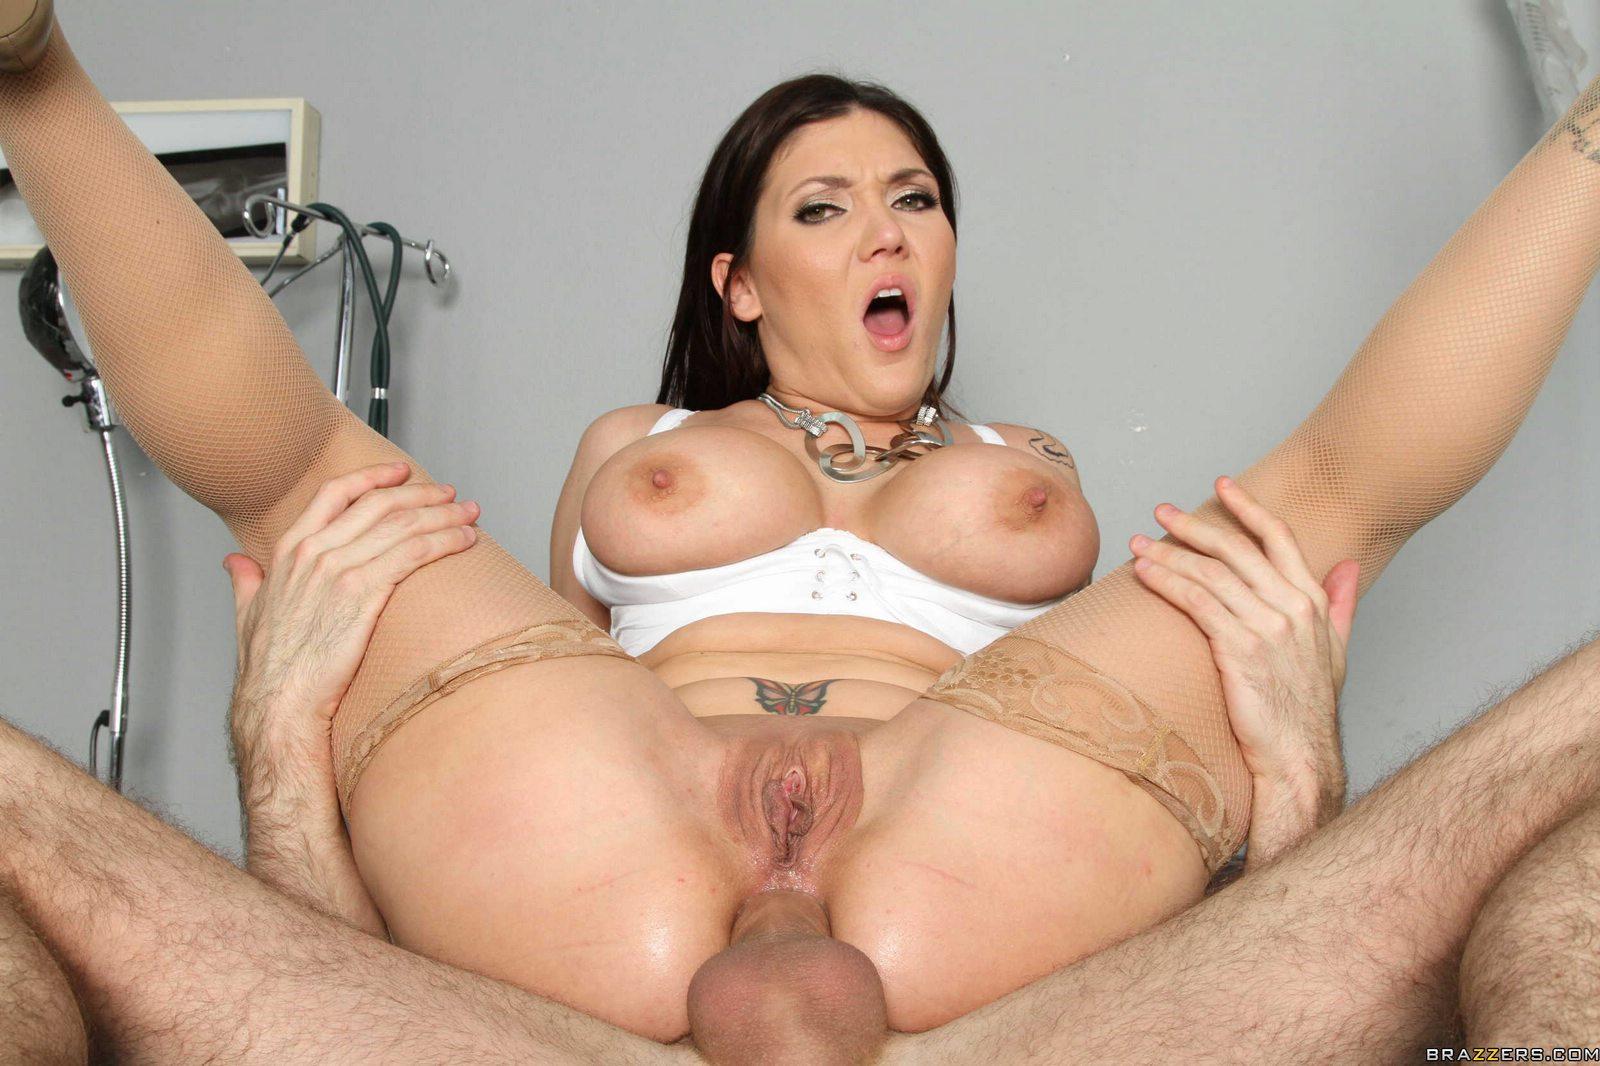 Hot pornstars gag on cock